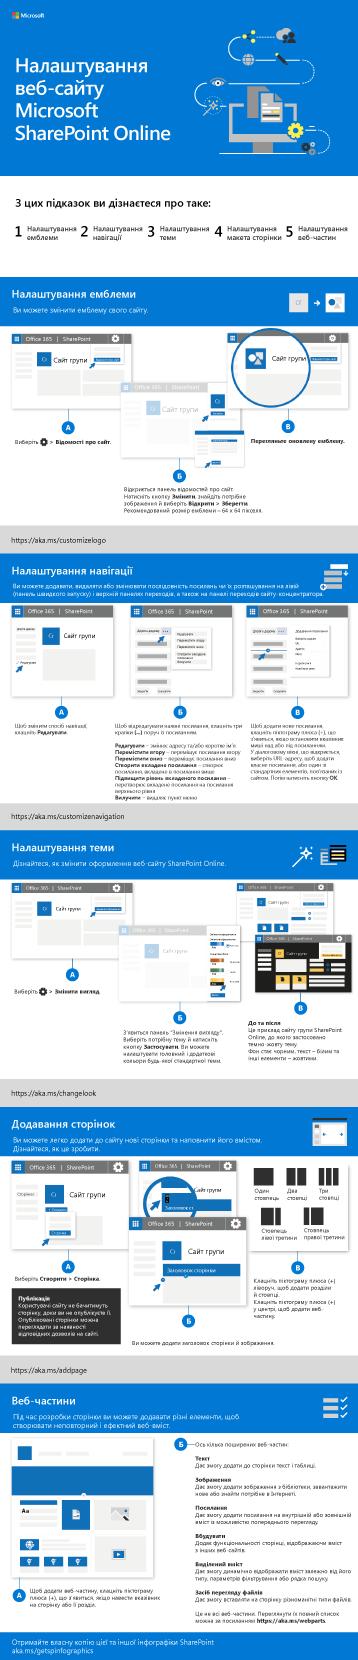 Налаштування сайту SharePoint